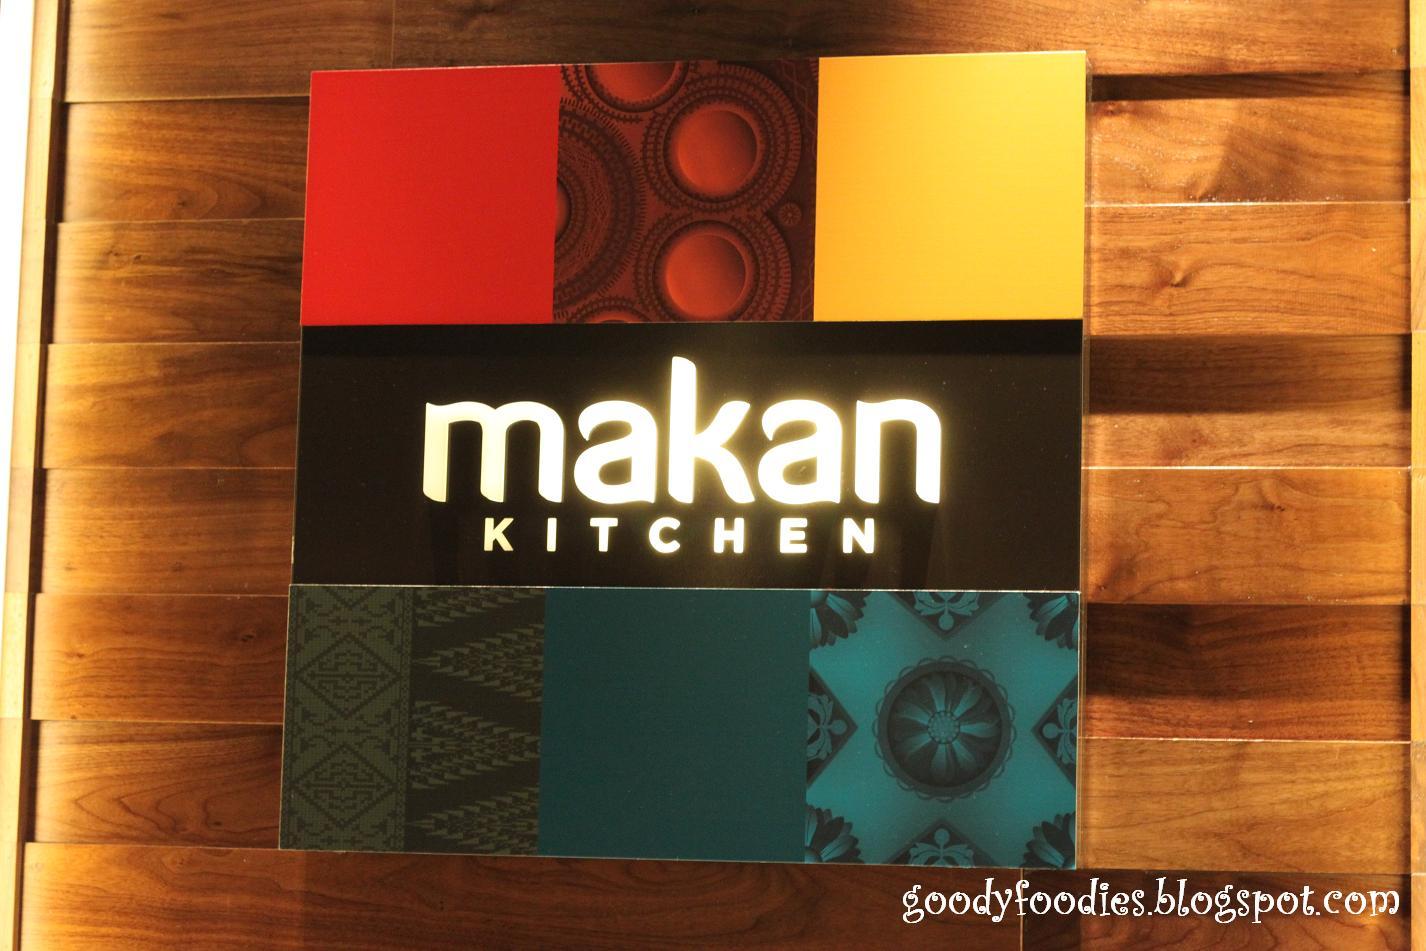 GoodyFoodies: Makan Kitchen, Doubletree by Hilton, Kuala Lumpur